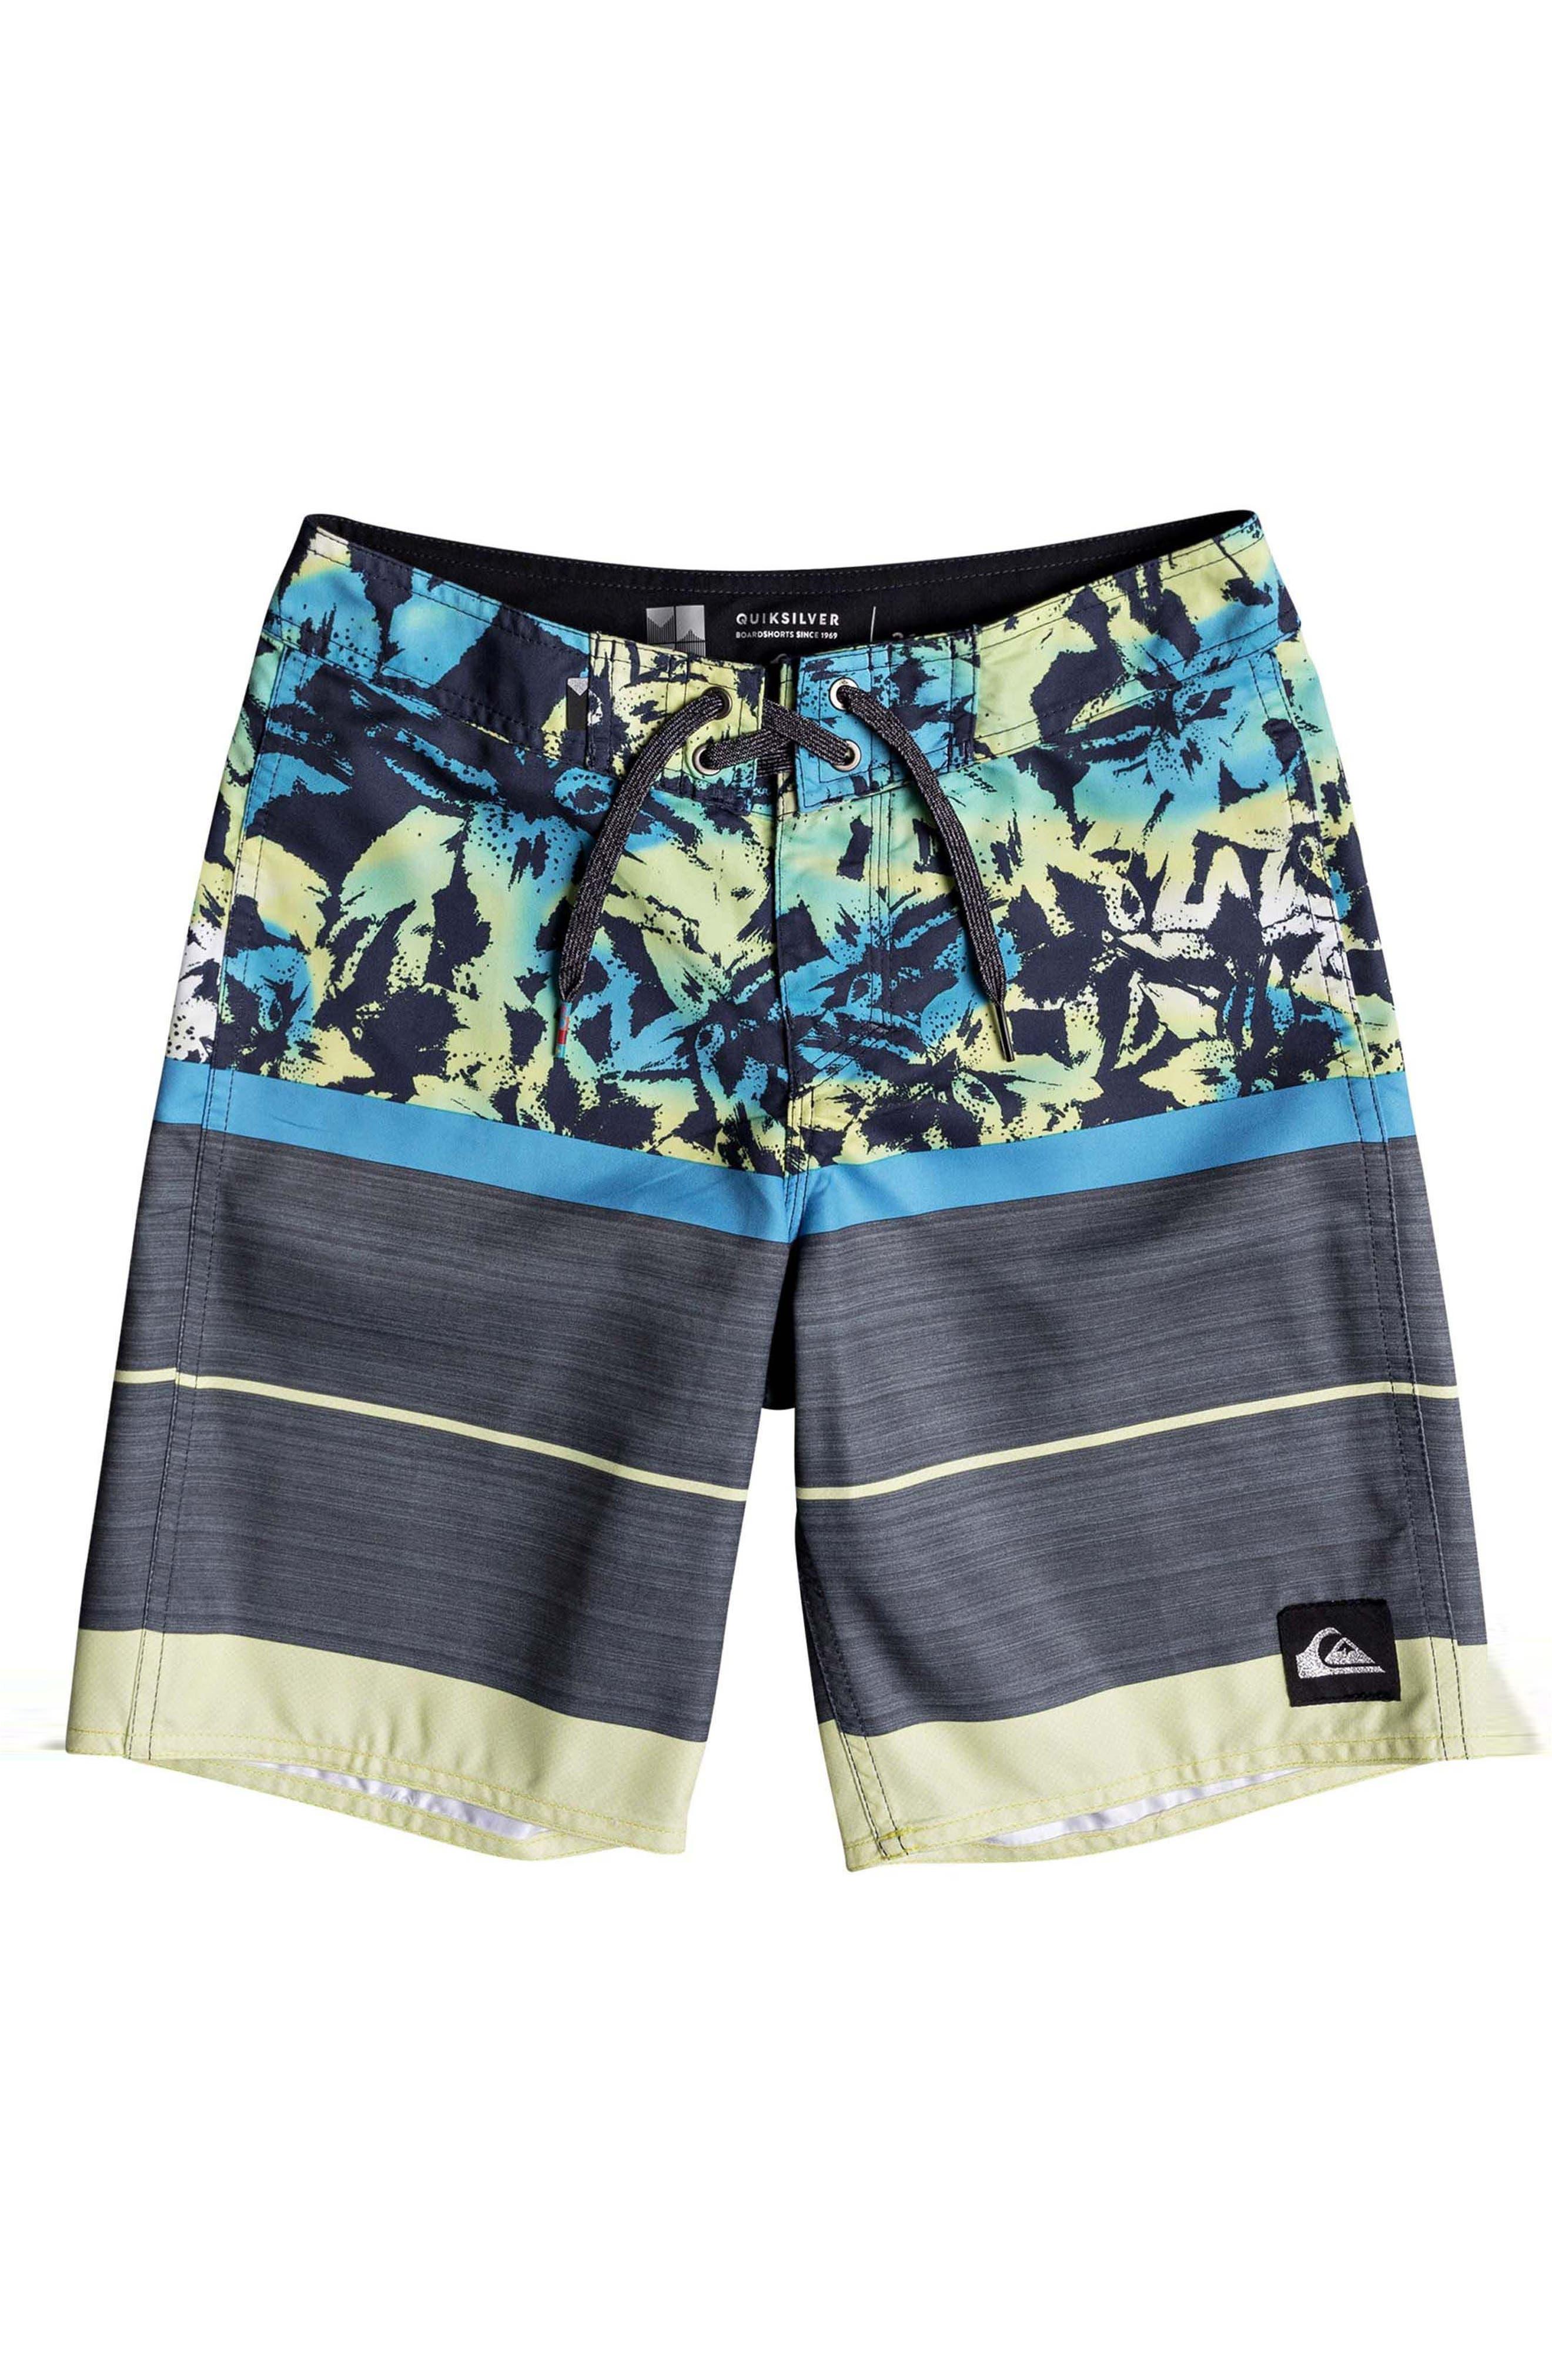 Slab Island Board Shorts,                             Main thumbnail 1, color,                             Cyan Blue